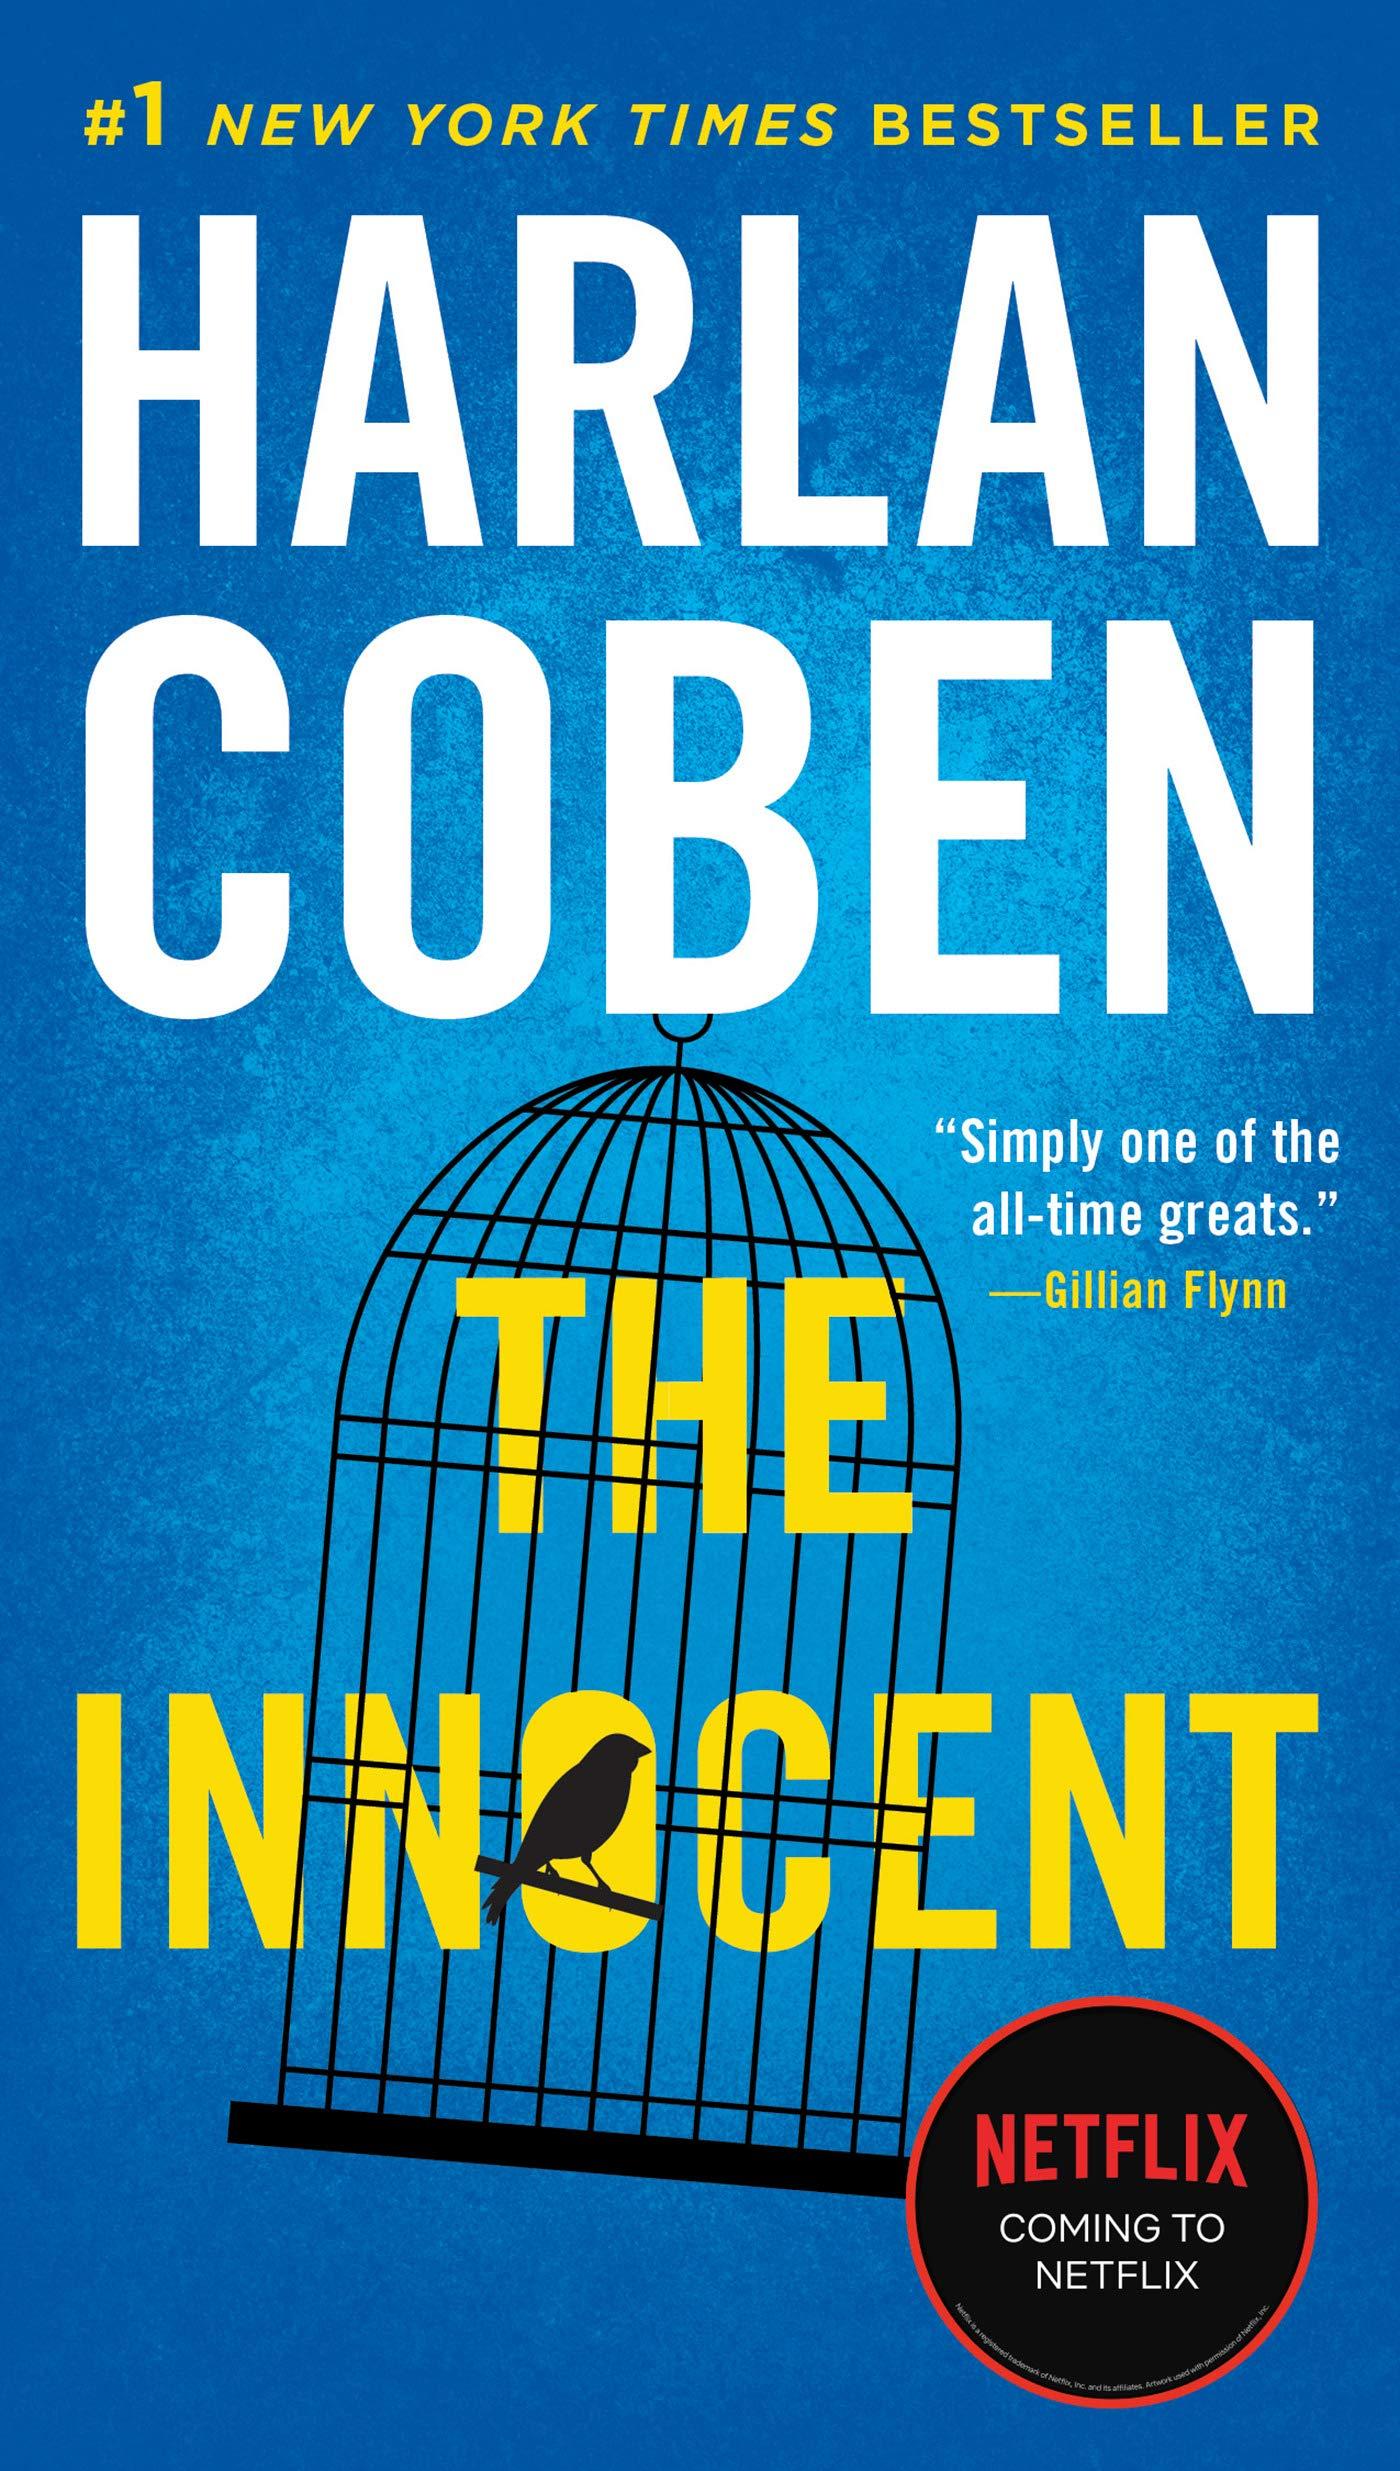 Innocent Suspense Thriller Harlan Coben ebook